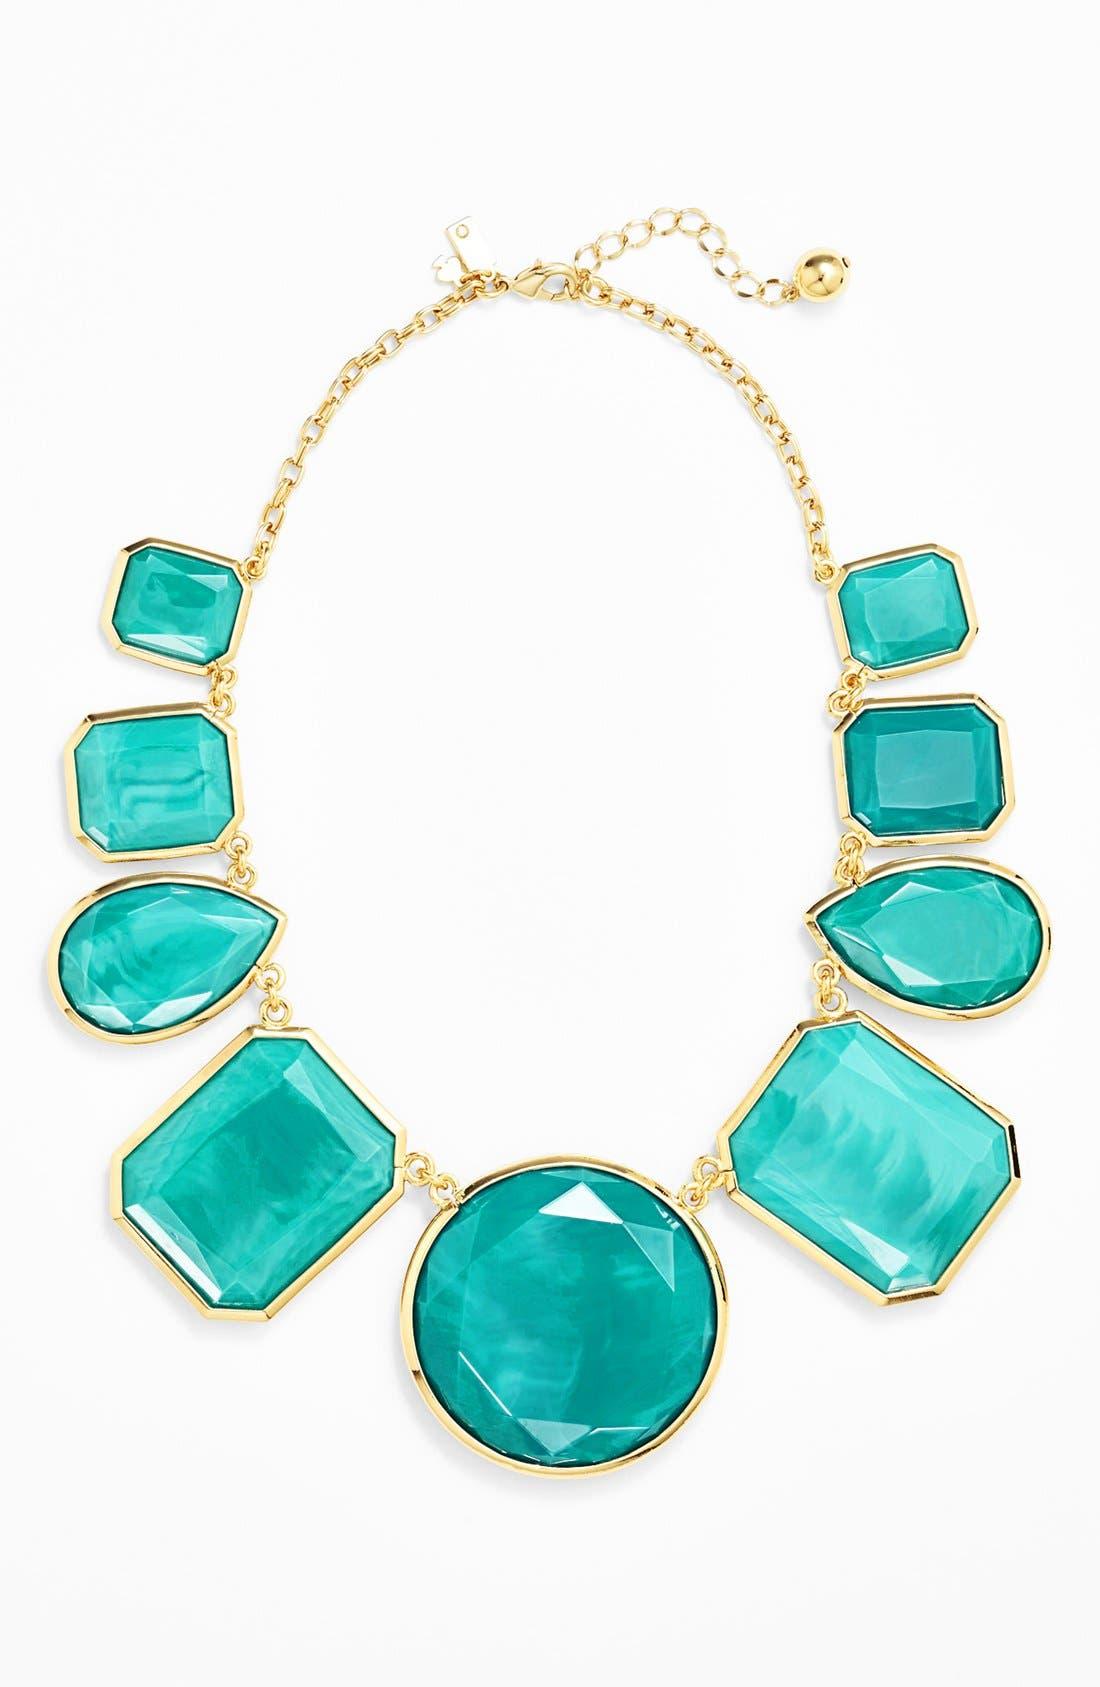 Main Image - kate spade new york 'swirl around' graduated stone necklace